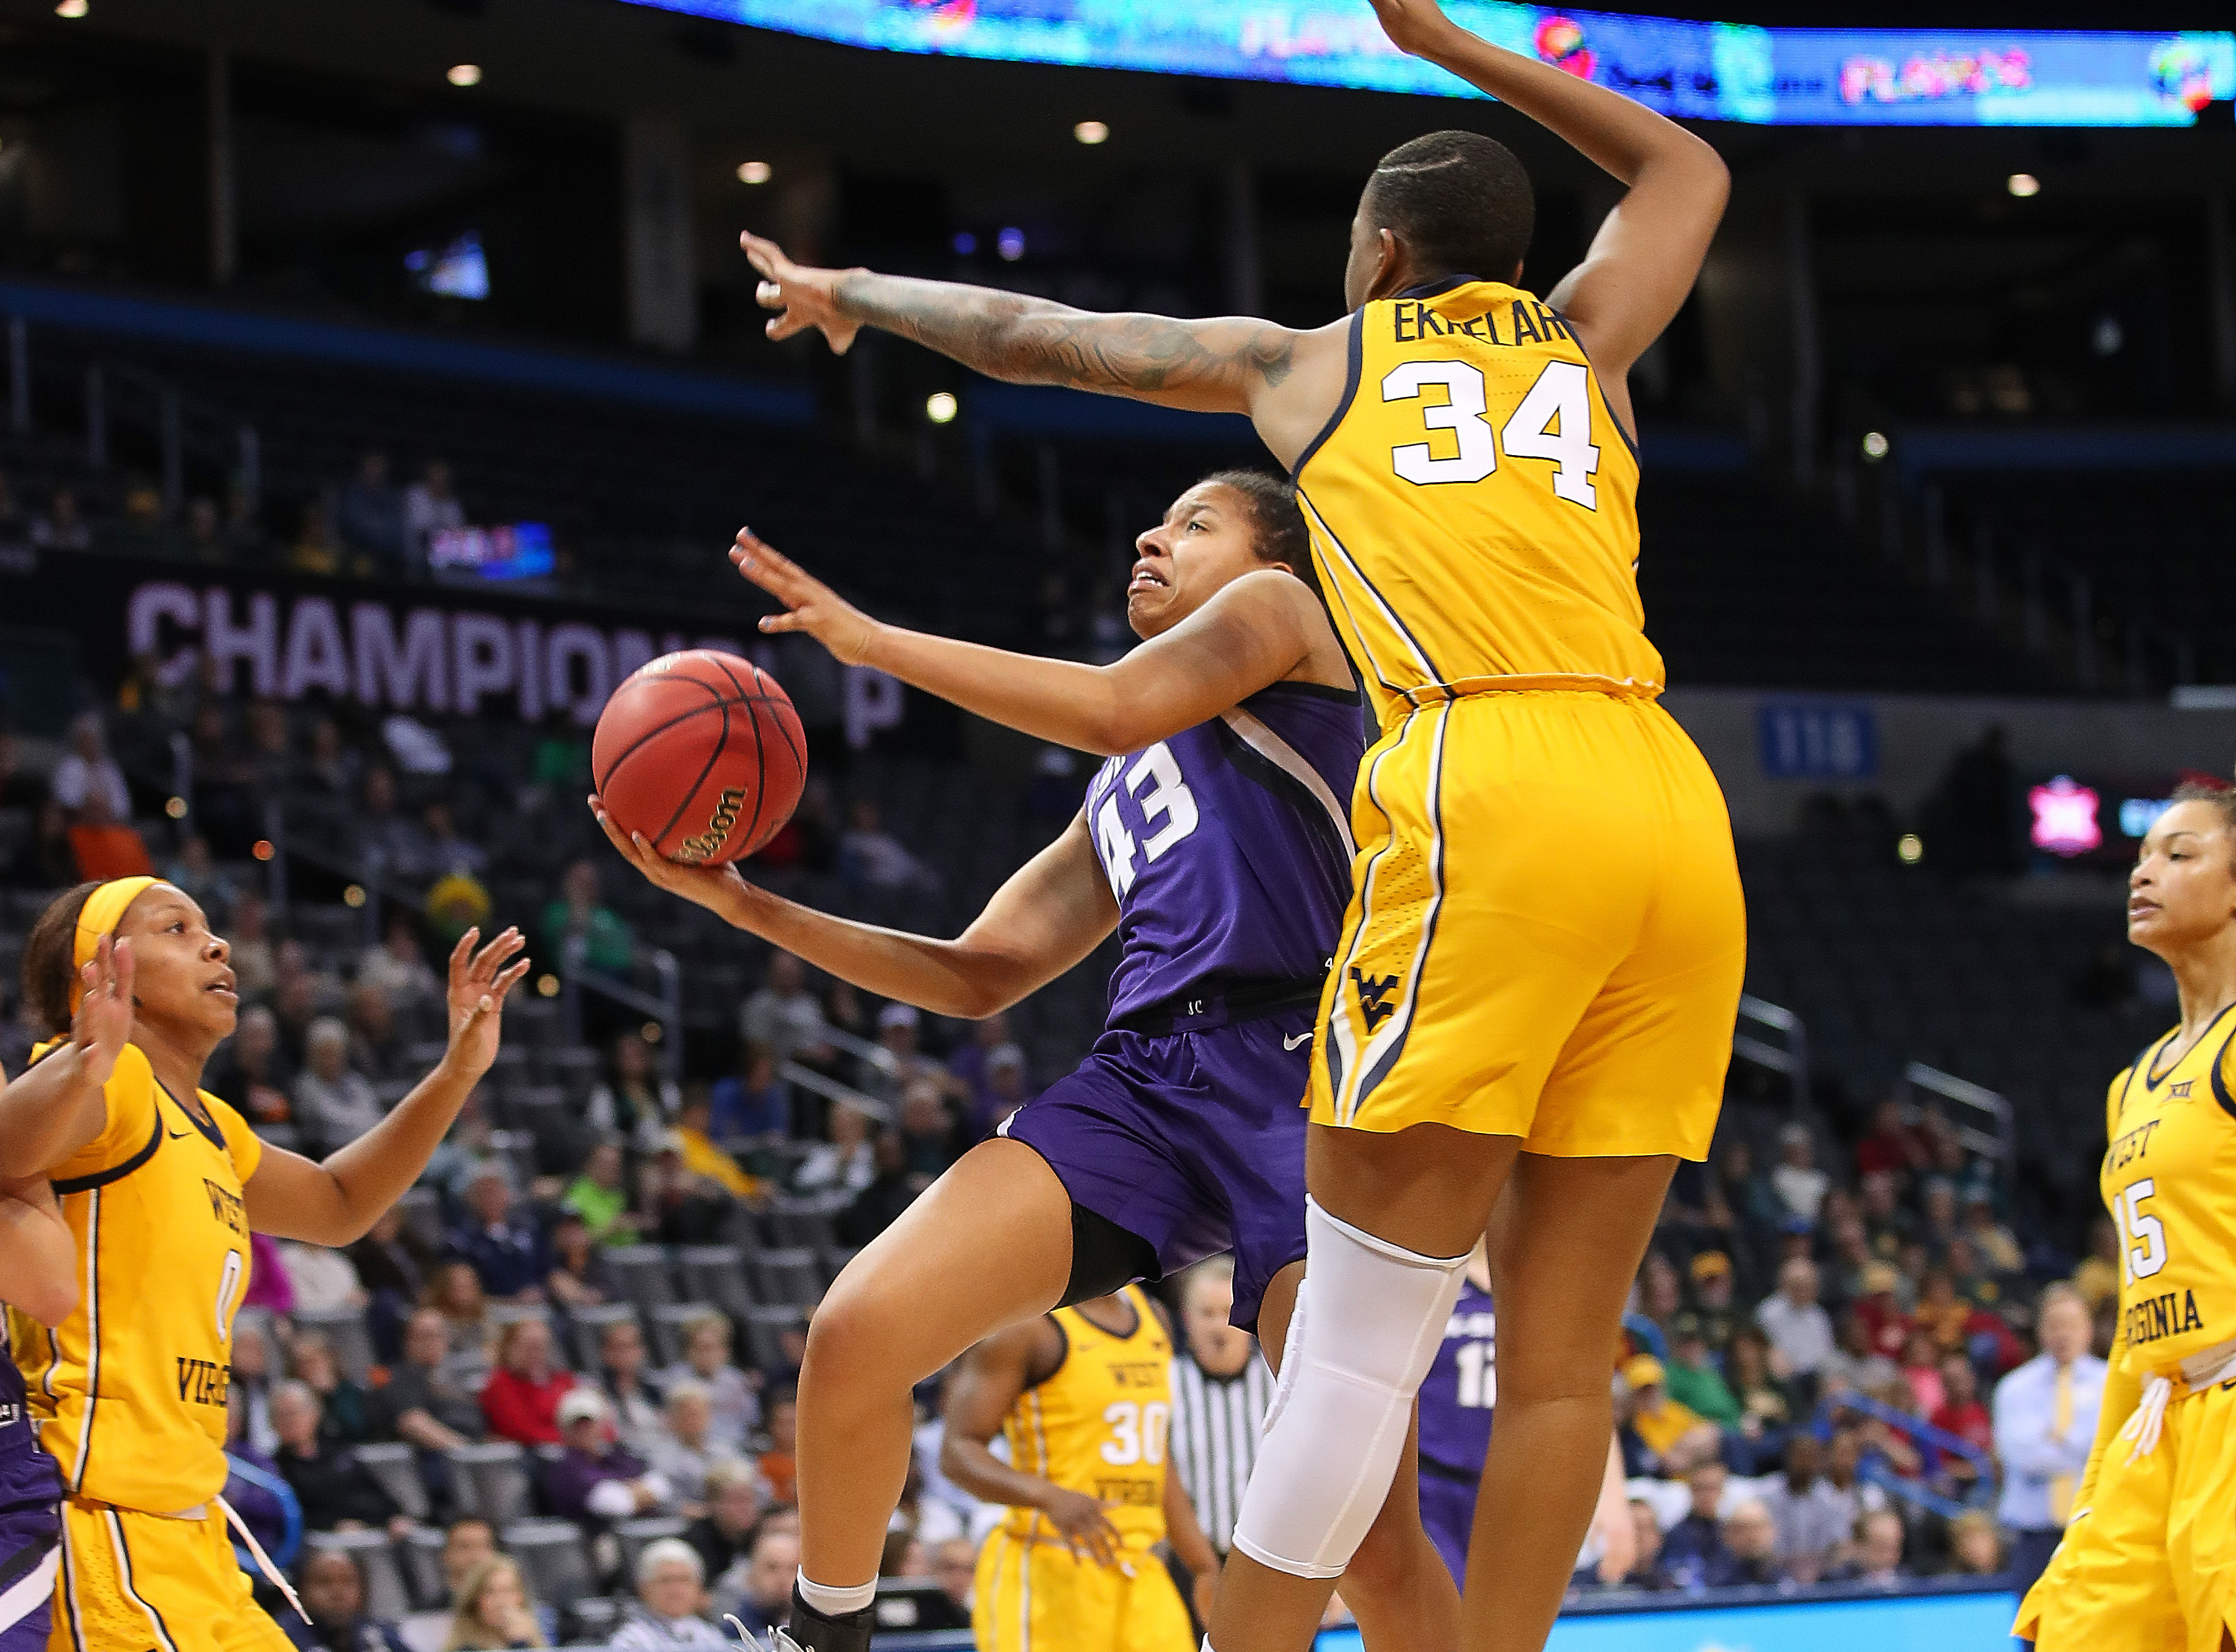 COLLEGE BASKETBALL: MAR 09 Big 12 Conference Women's Championship - West Virginia v Kansas State